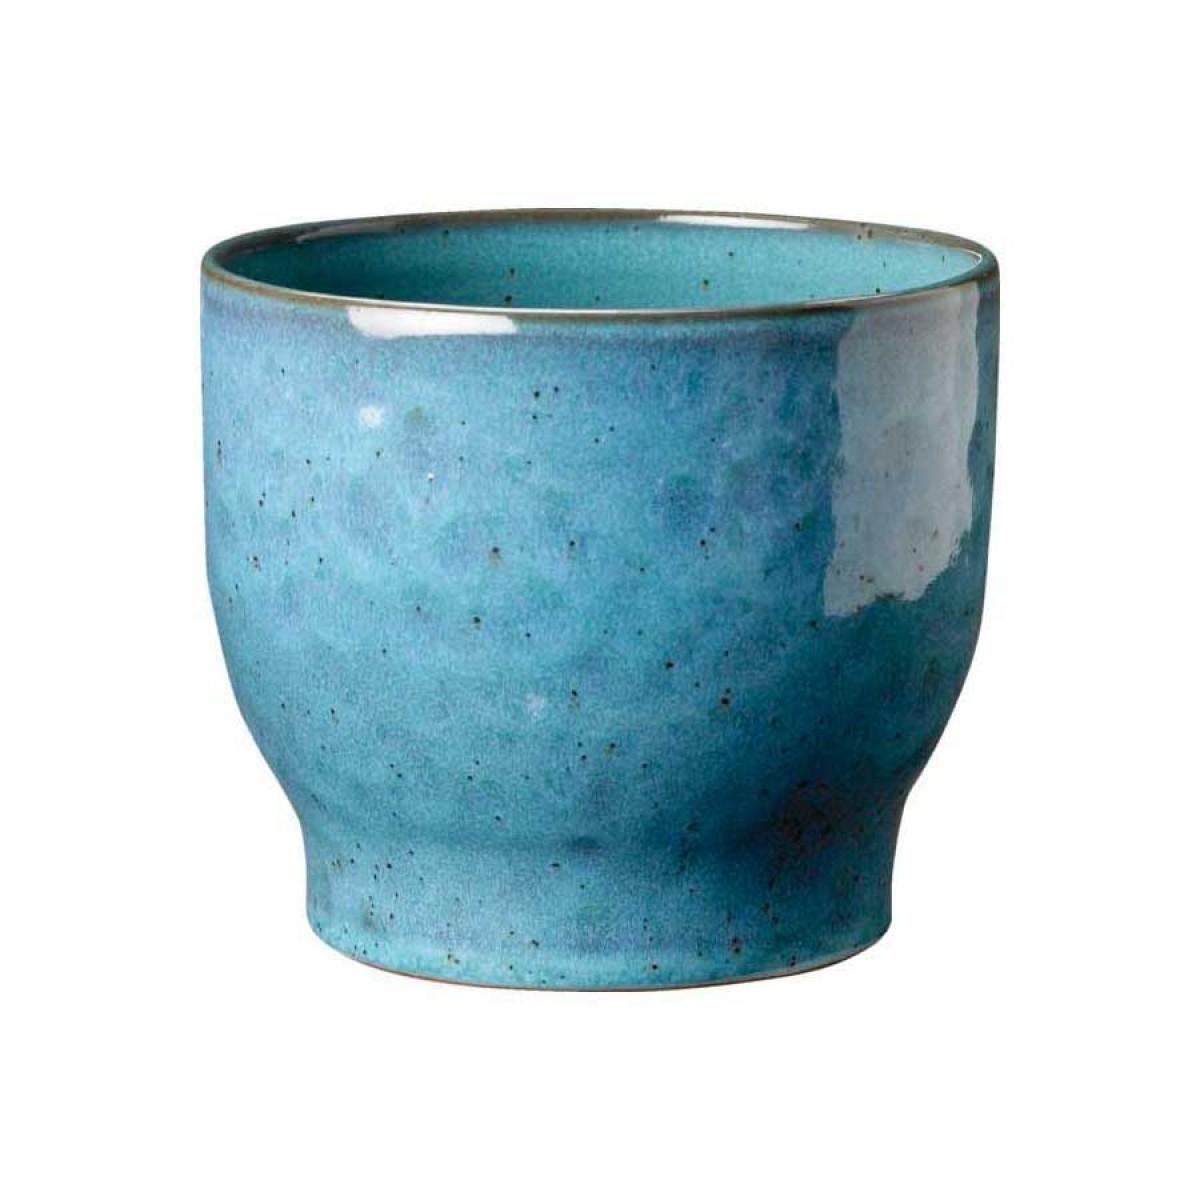 KNABSTRUP Keramik Urtepotteskjuler, støvet blå, Ø14,5 cm